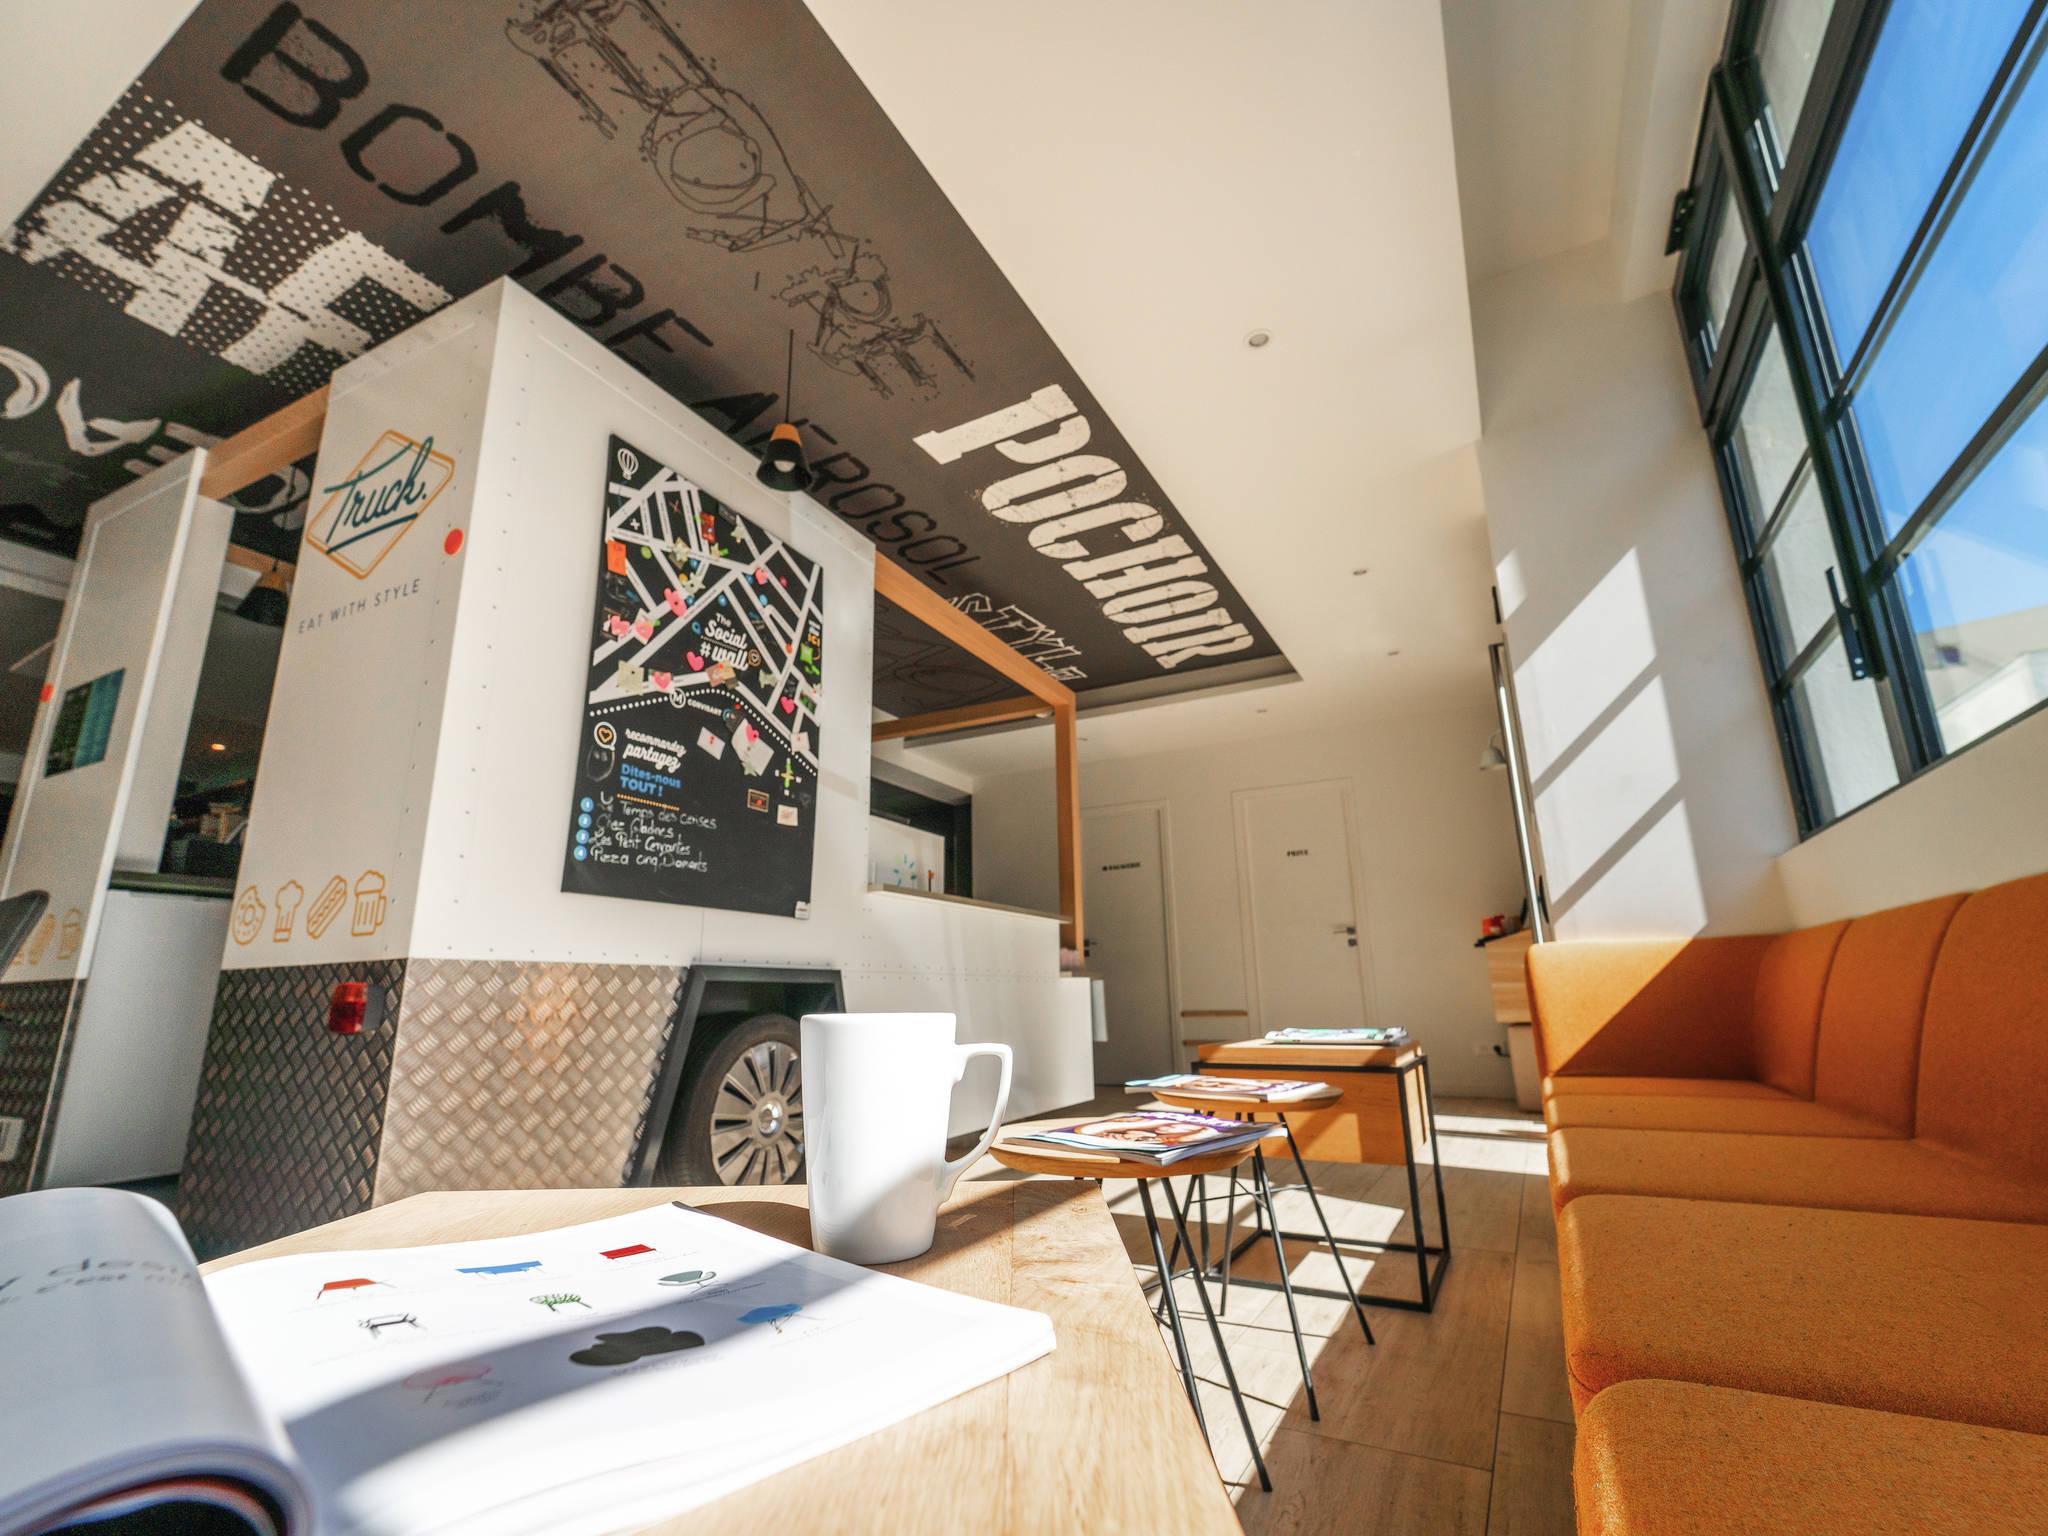 Hotel in paris ibis styles paris place d 39 italie butte for Hotels ibis france